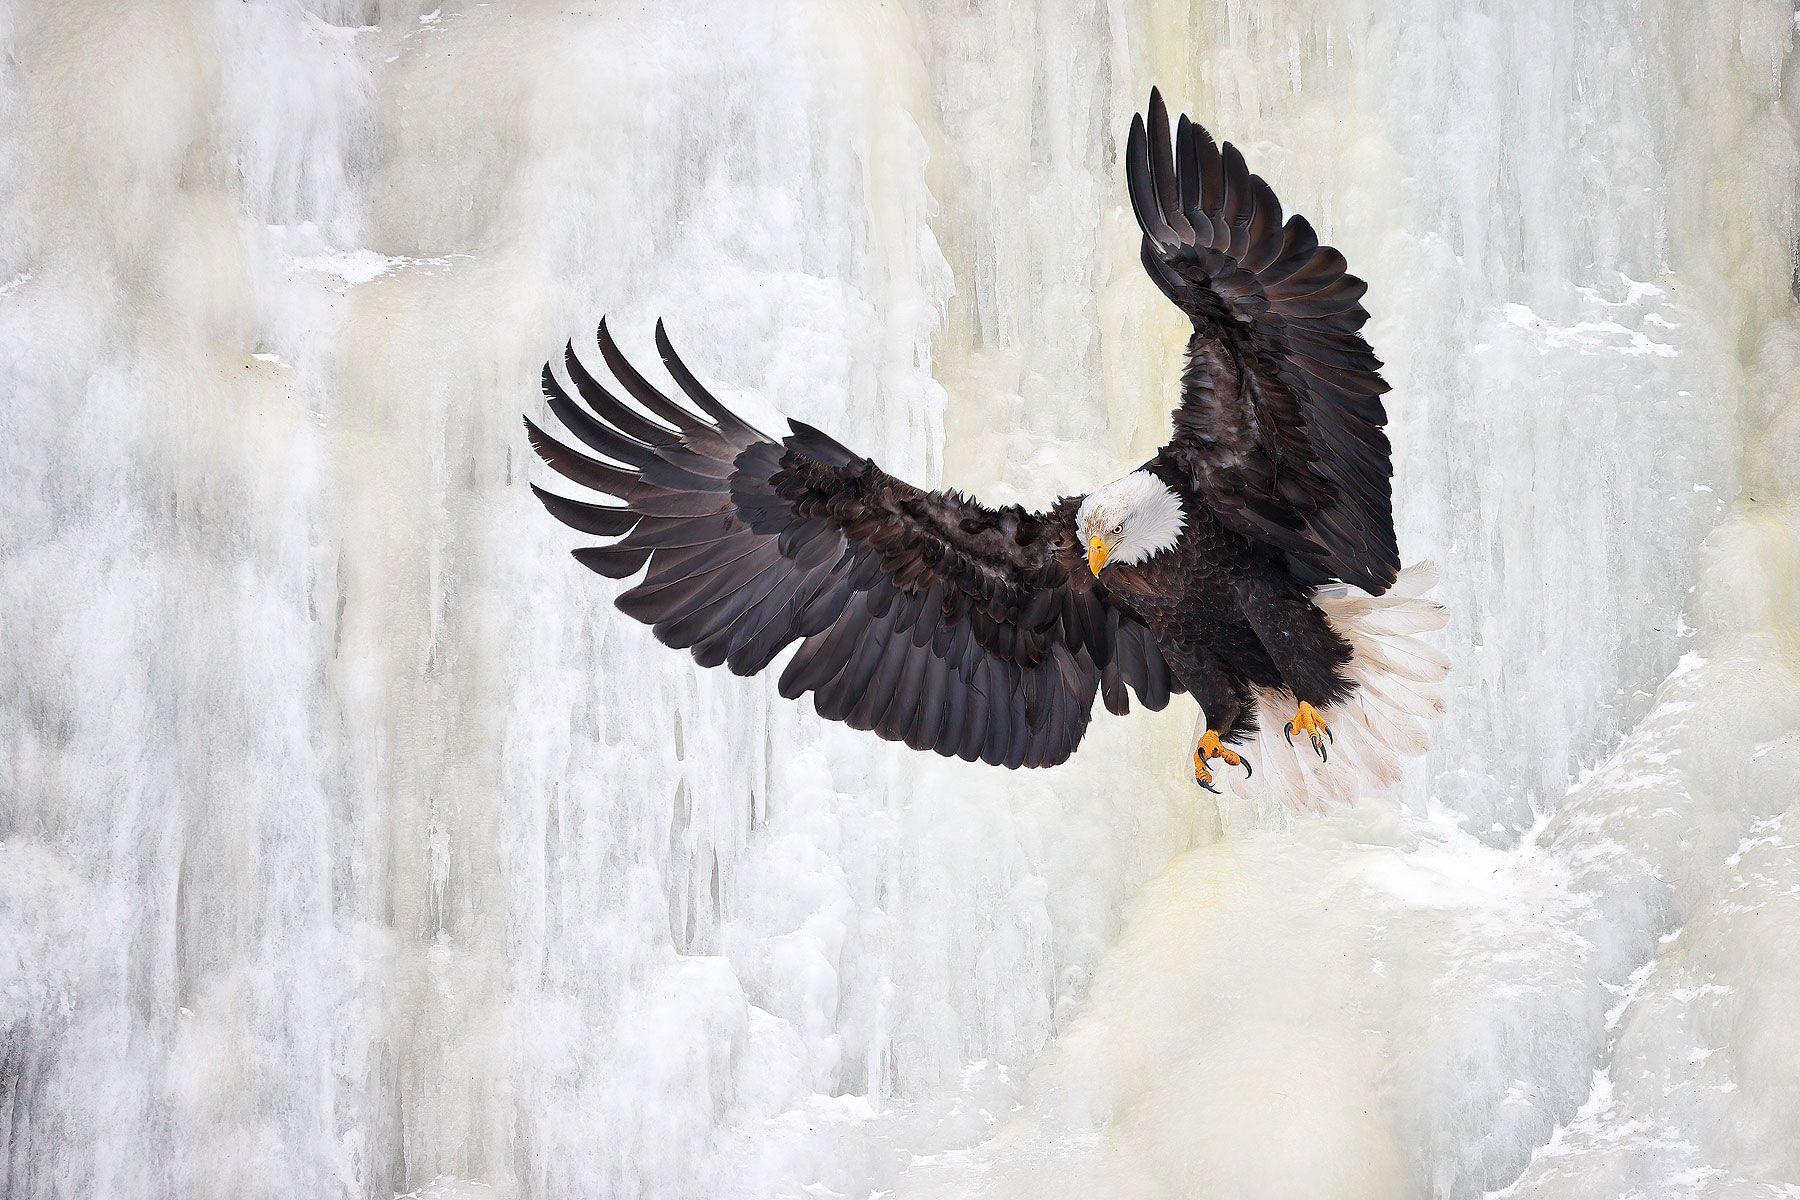 Bald-eagle-dropping-down-ice-waterfall_74I1031-Kachemak-Bay,-Alaska,-USA.jpg